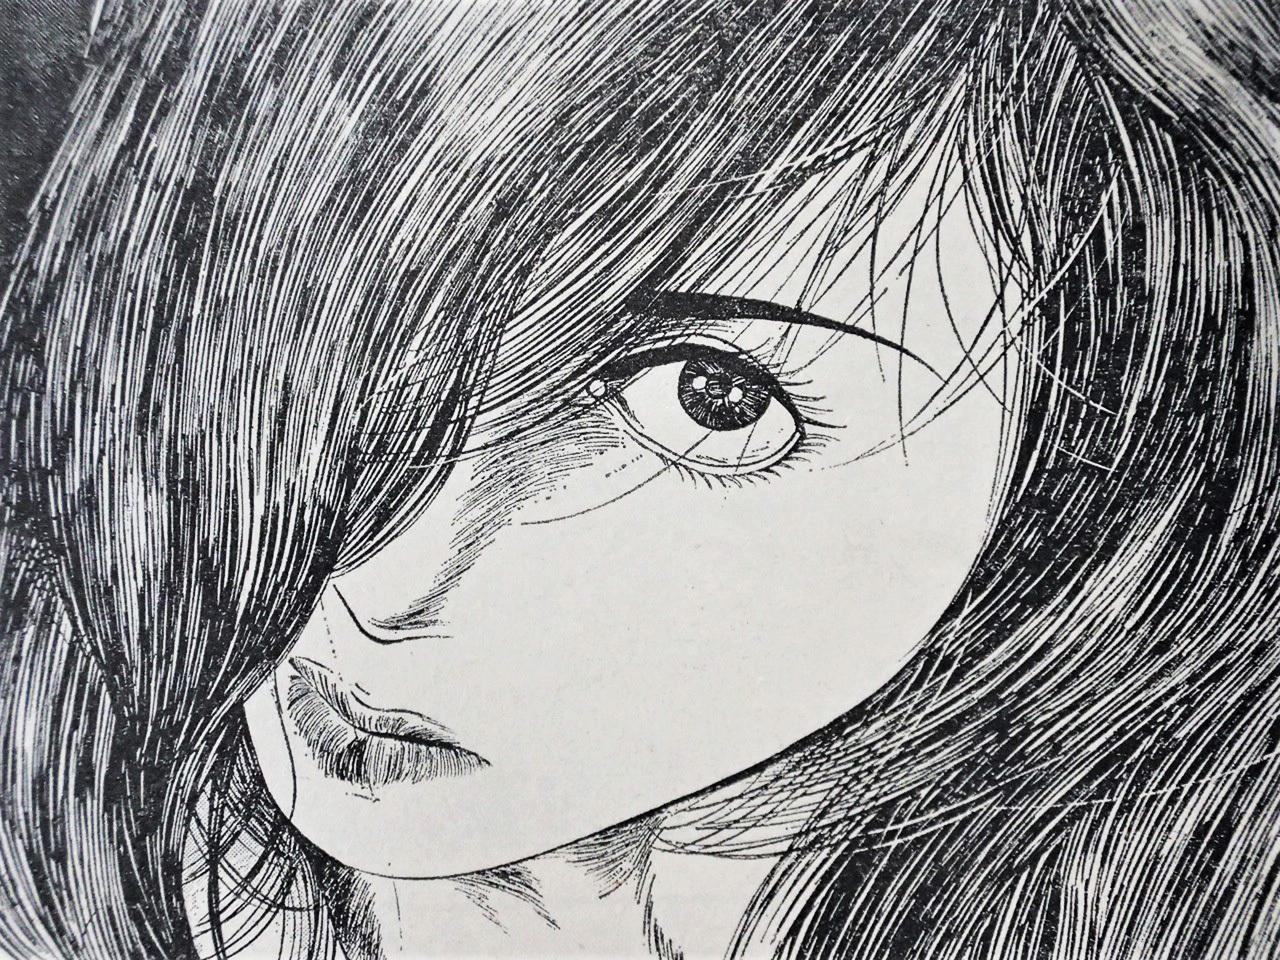 IshiiTakashi_HinoNaraku.jpg